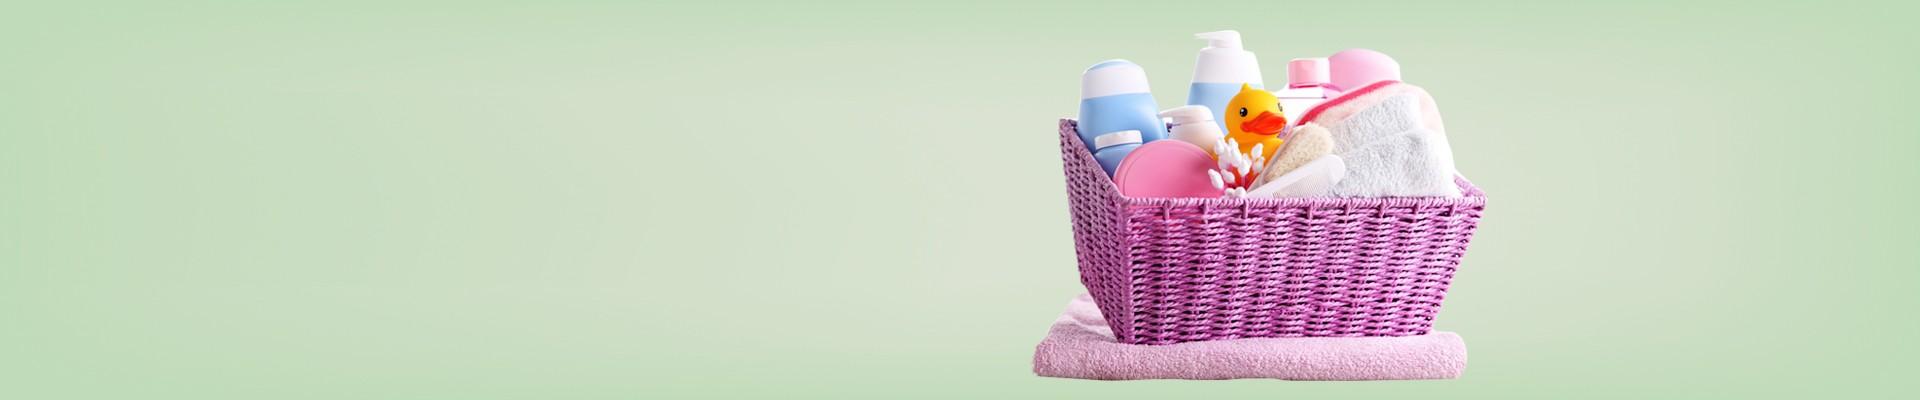 Jual Perlengkapan Mandi Bayi Terbaik & Terlengkap